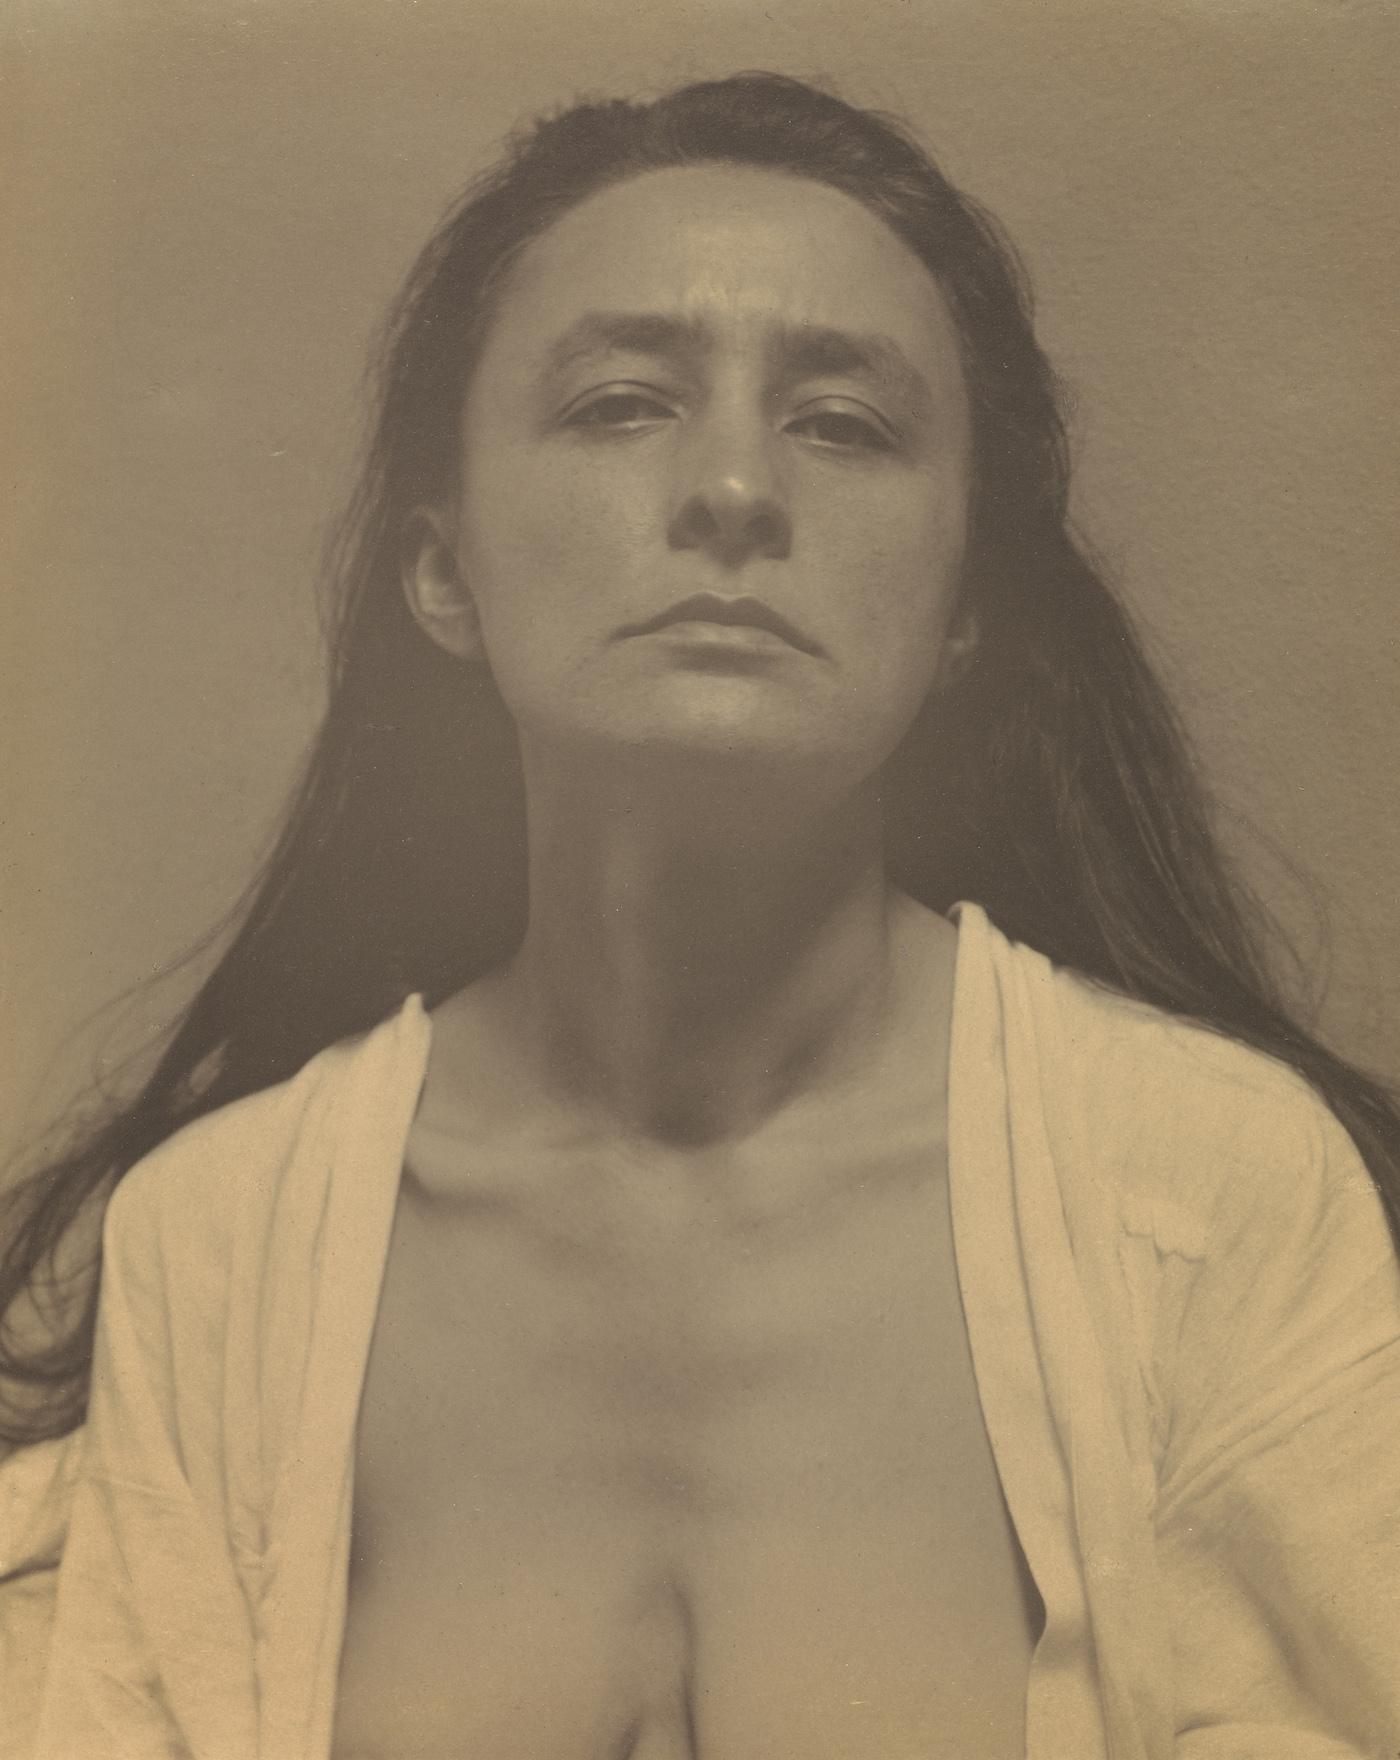 Georgia O'Keeffe: A Portrait; Alfred Stieglitz (American, 1864 - 1946); United States; 1918; Palladium print; 24.8 x 20.3 cm (9 3/4 x 8 in.); 91.XM.63.13